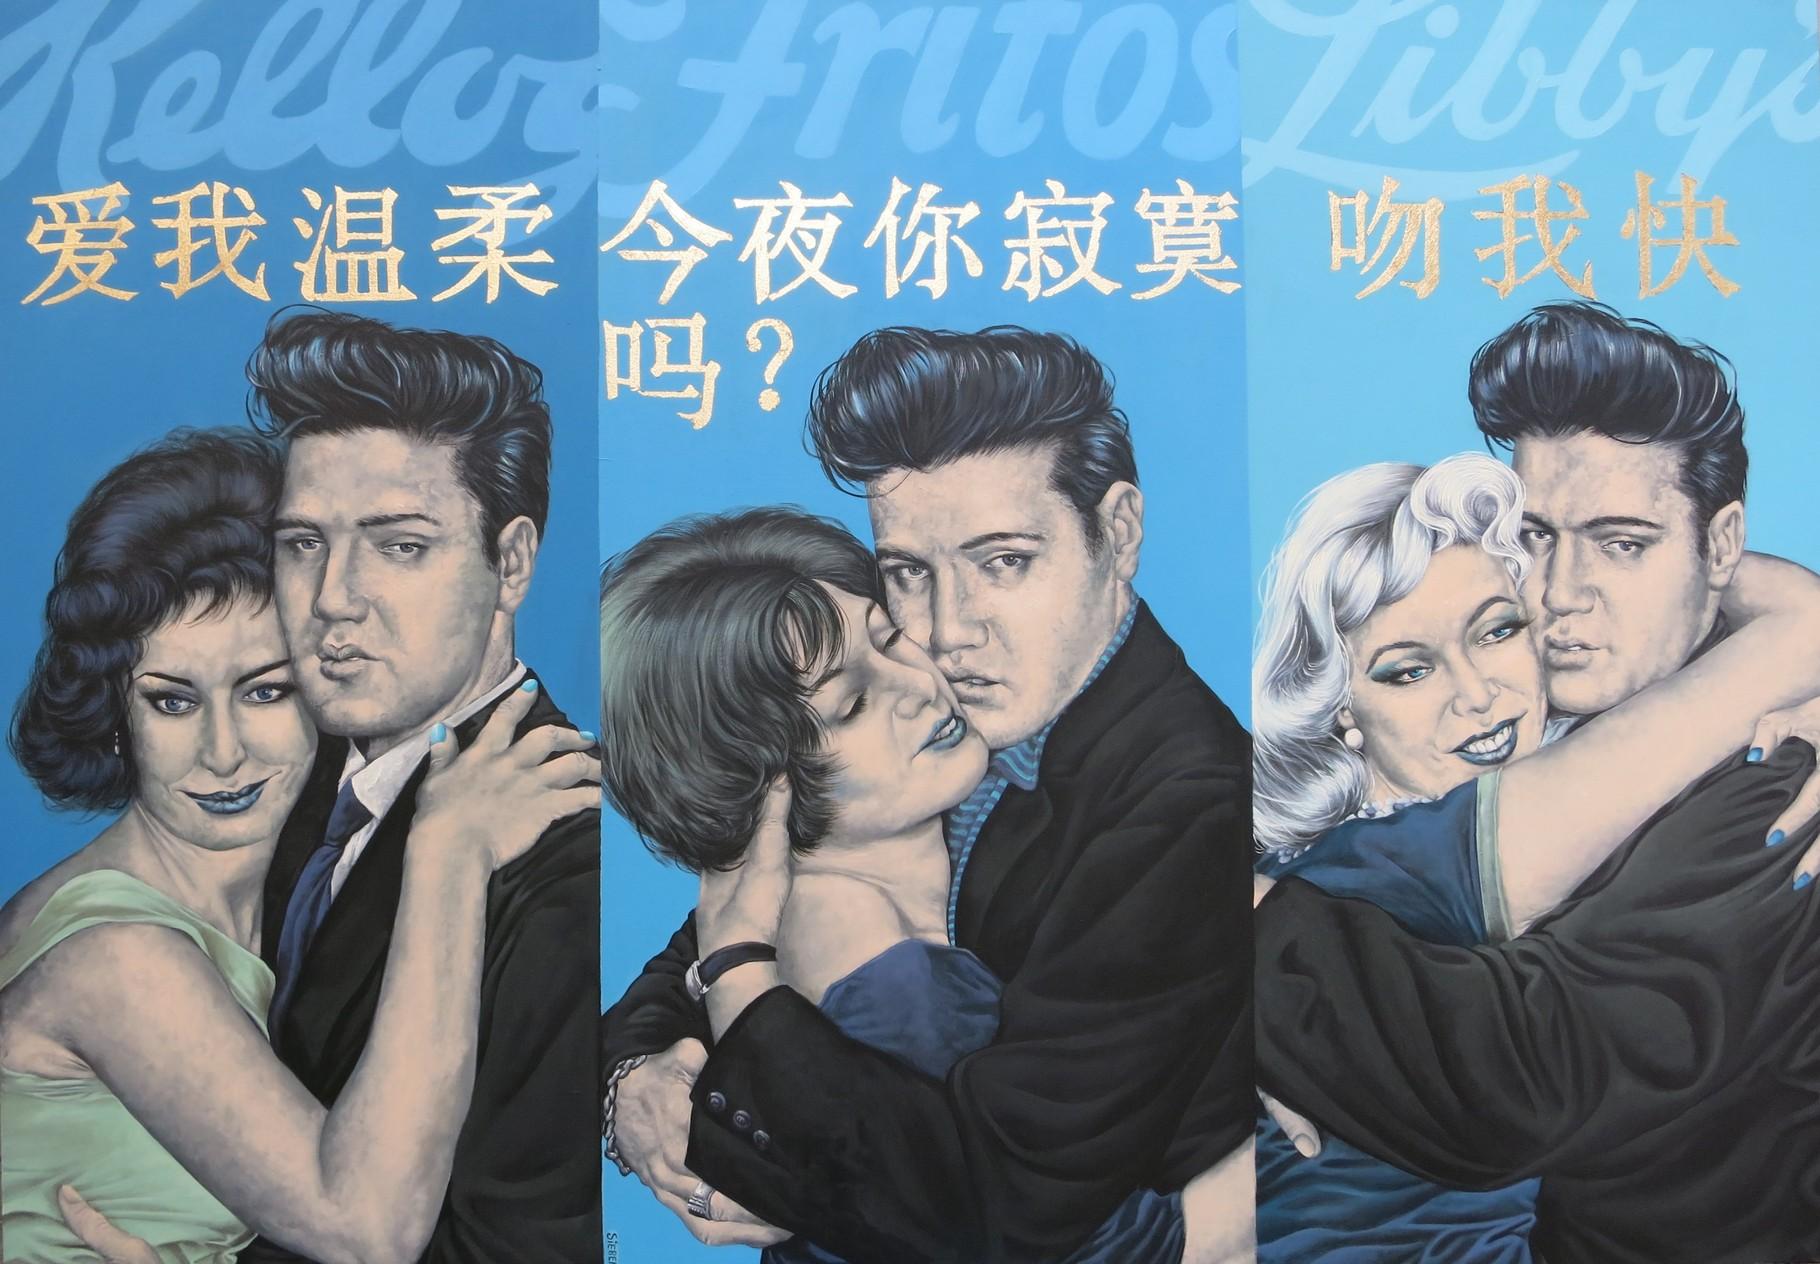 Gemälde  486 Are you lonesome tonight ?, Acryl, Kompositionsgold  auf Leinwand ,2015,140 x 200 cm